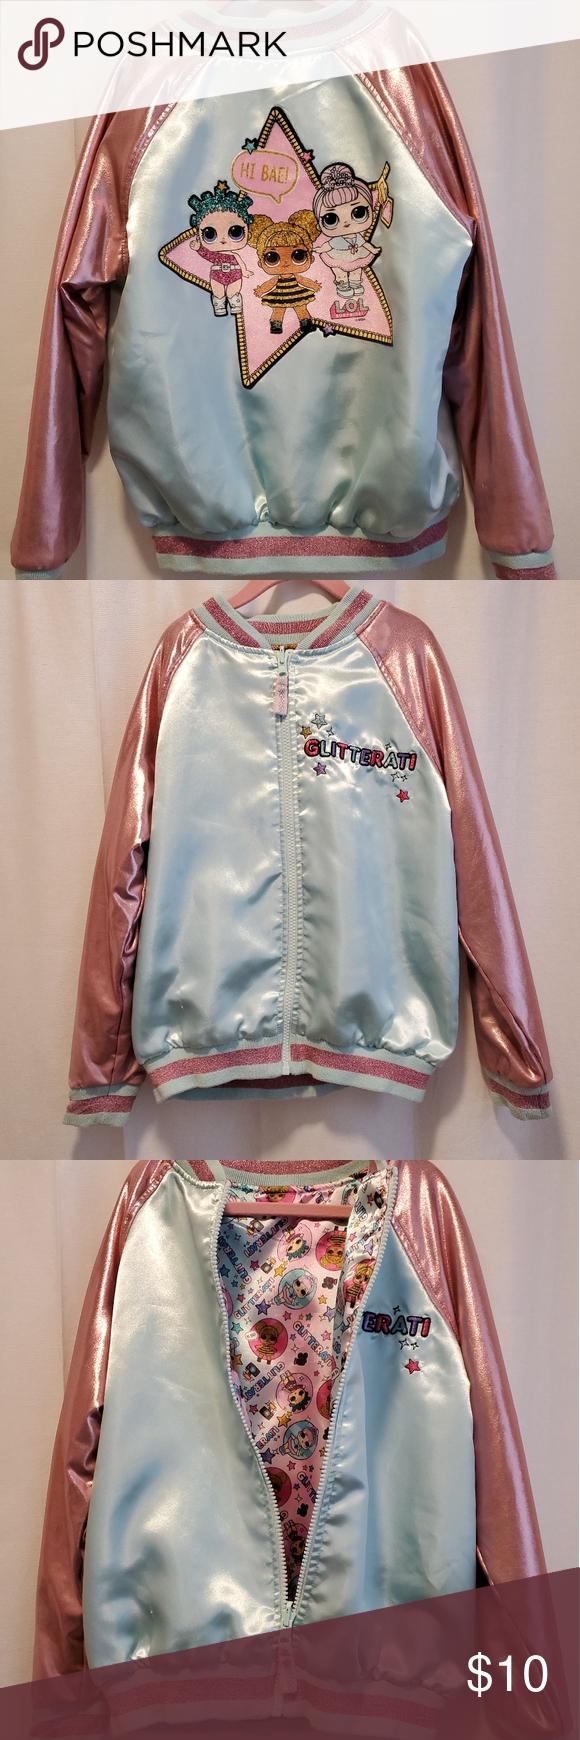 Lol Surprise Reversible Jacket Reversible Jackets Jackets Fashion [ 1740 x 580 Pixel ]